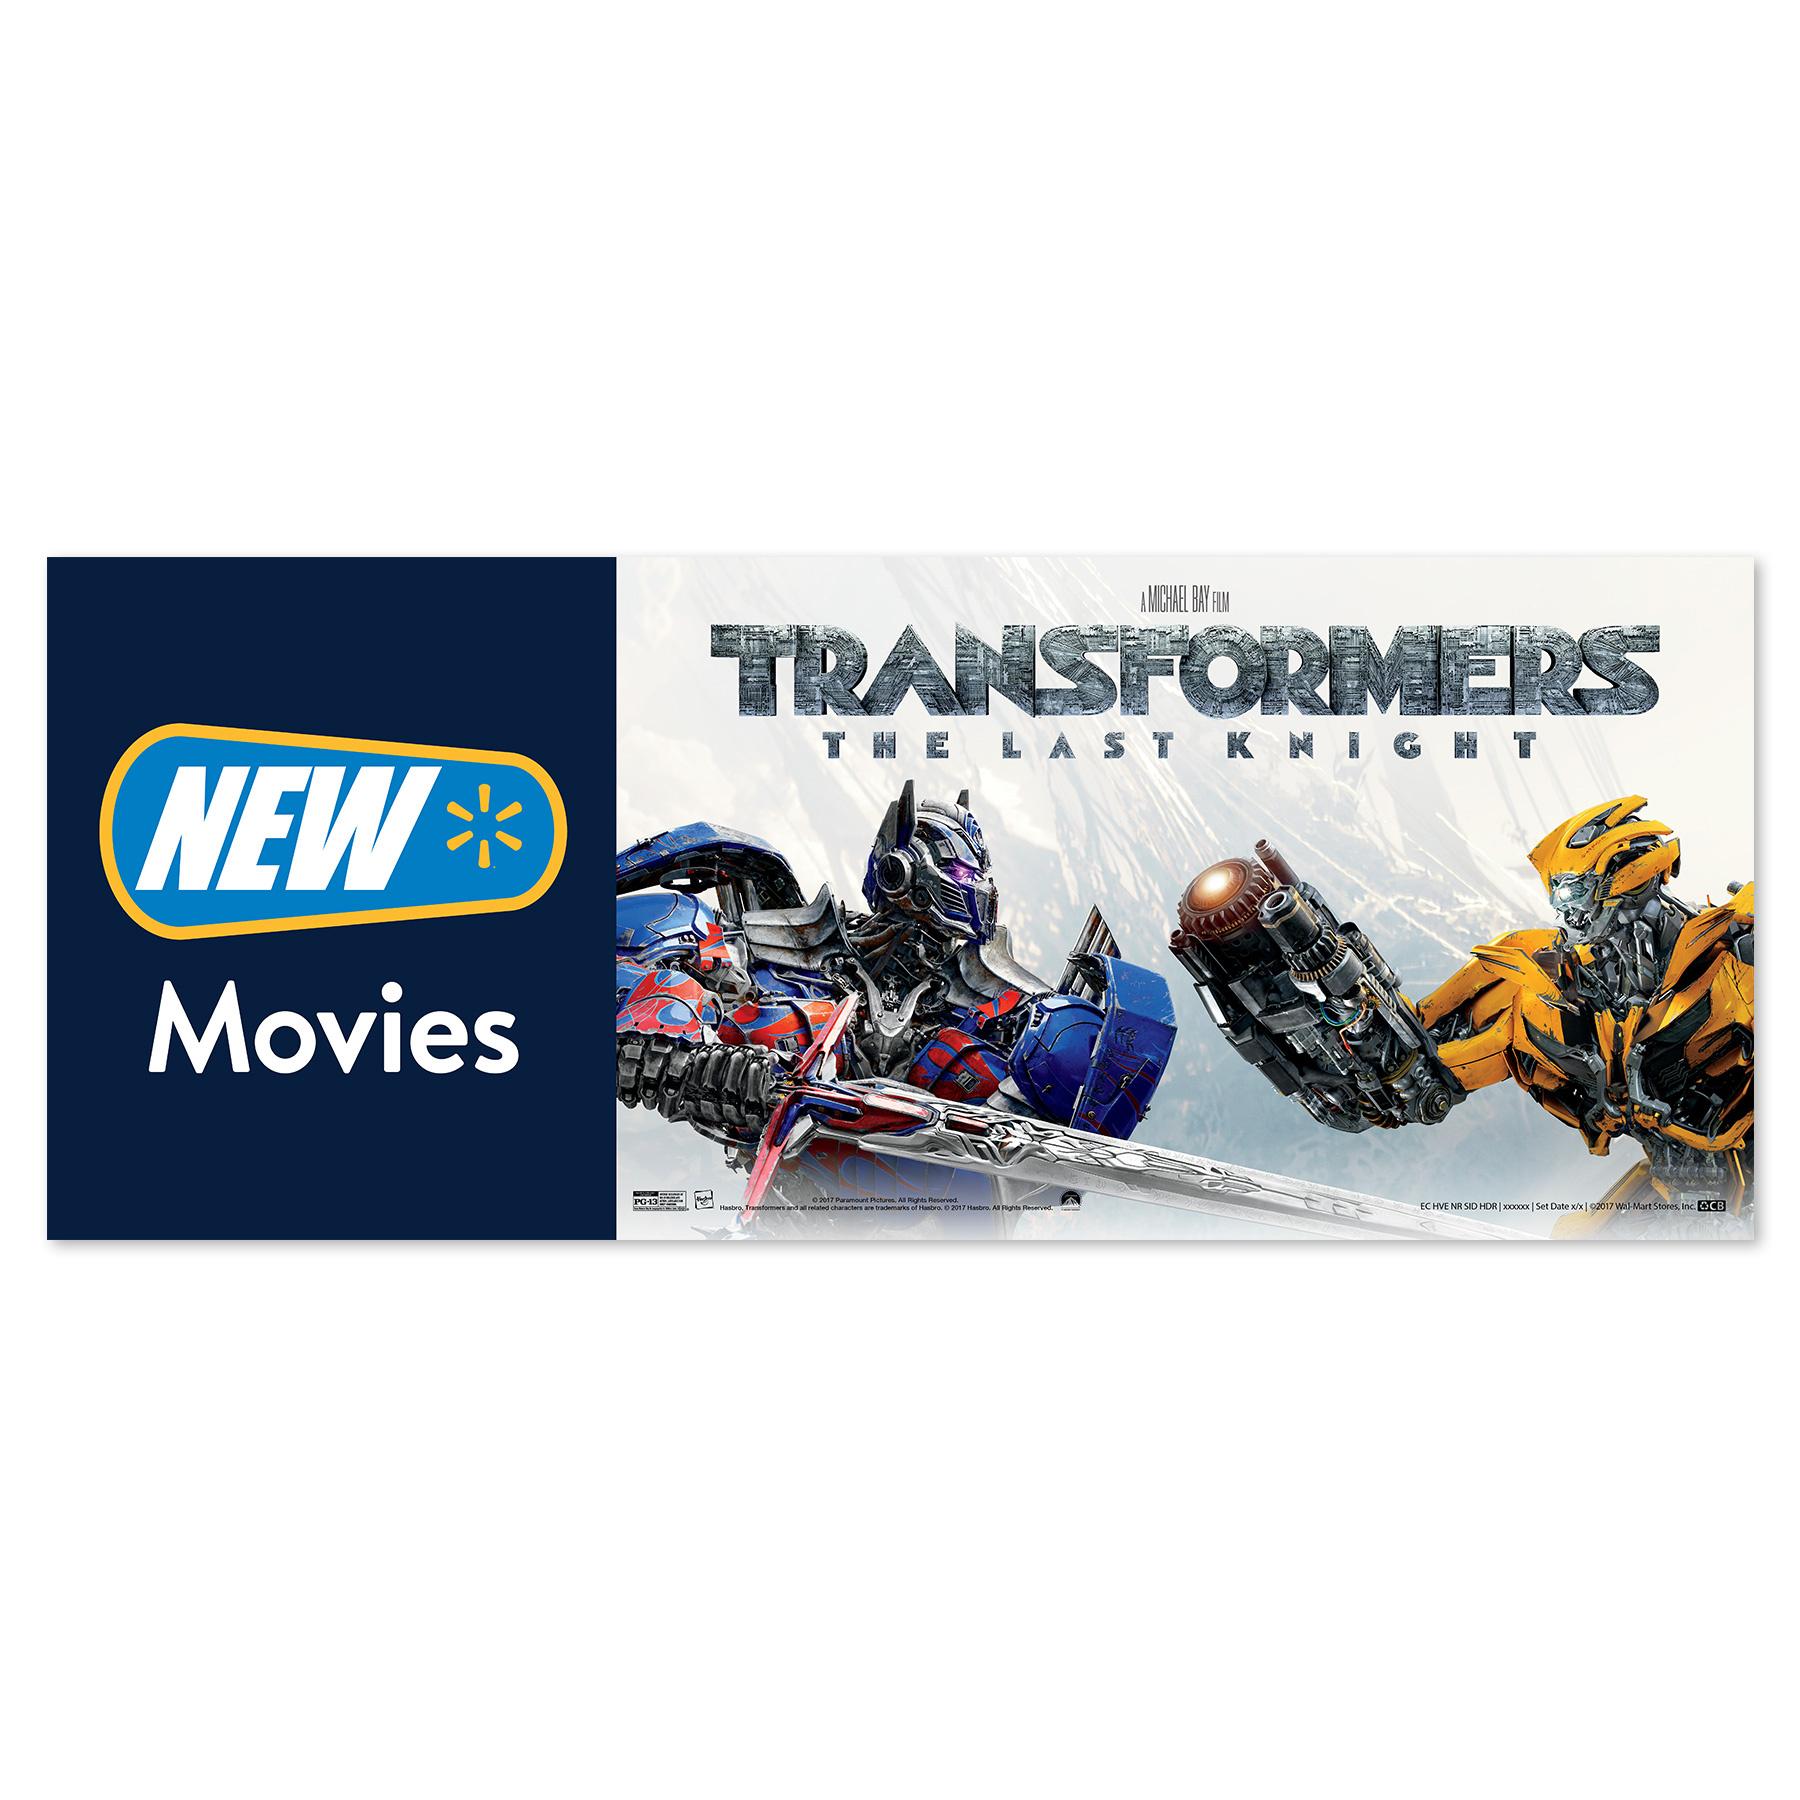 Transformers Walmart New Release Sign